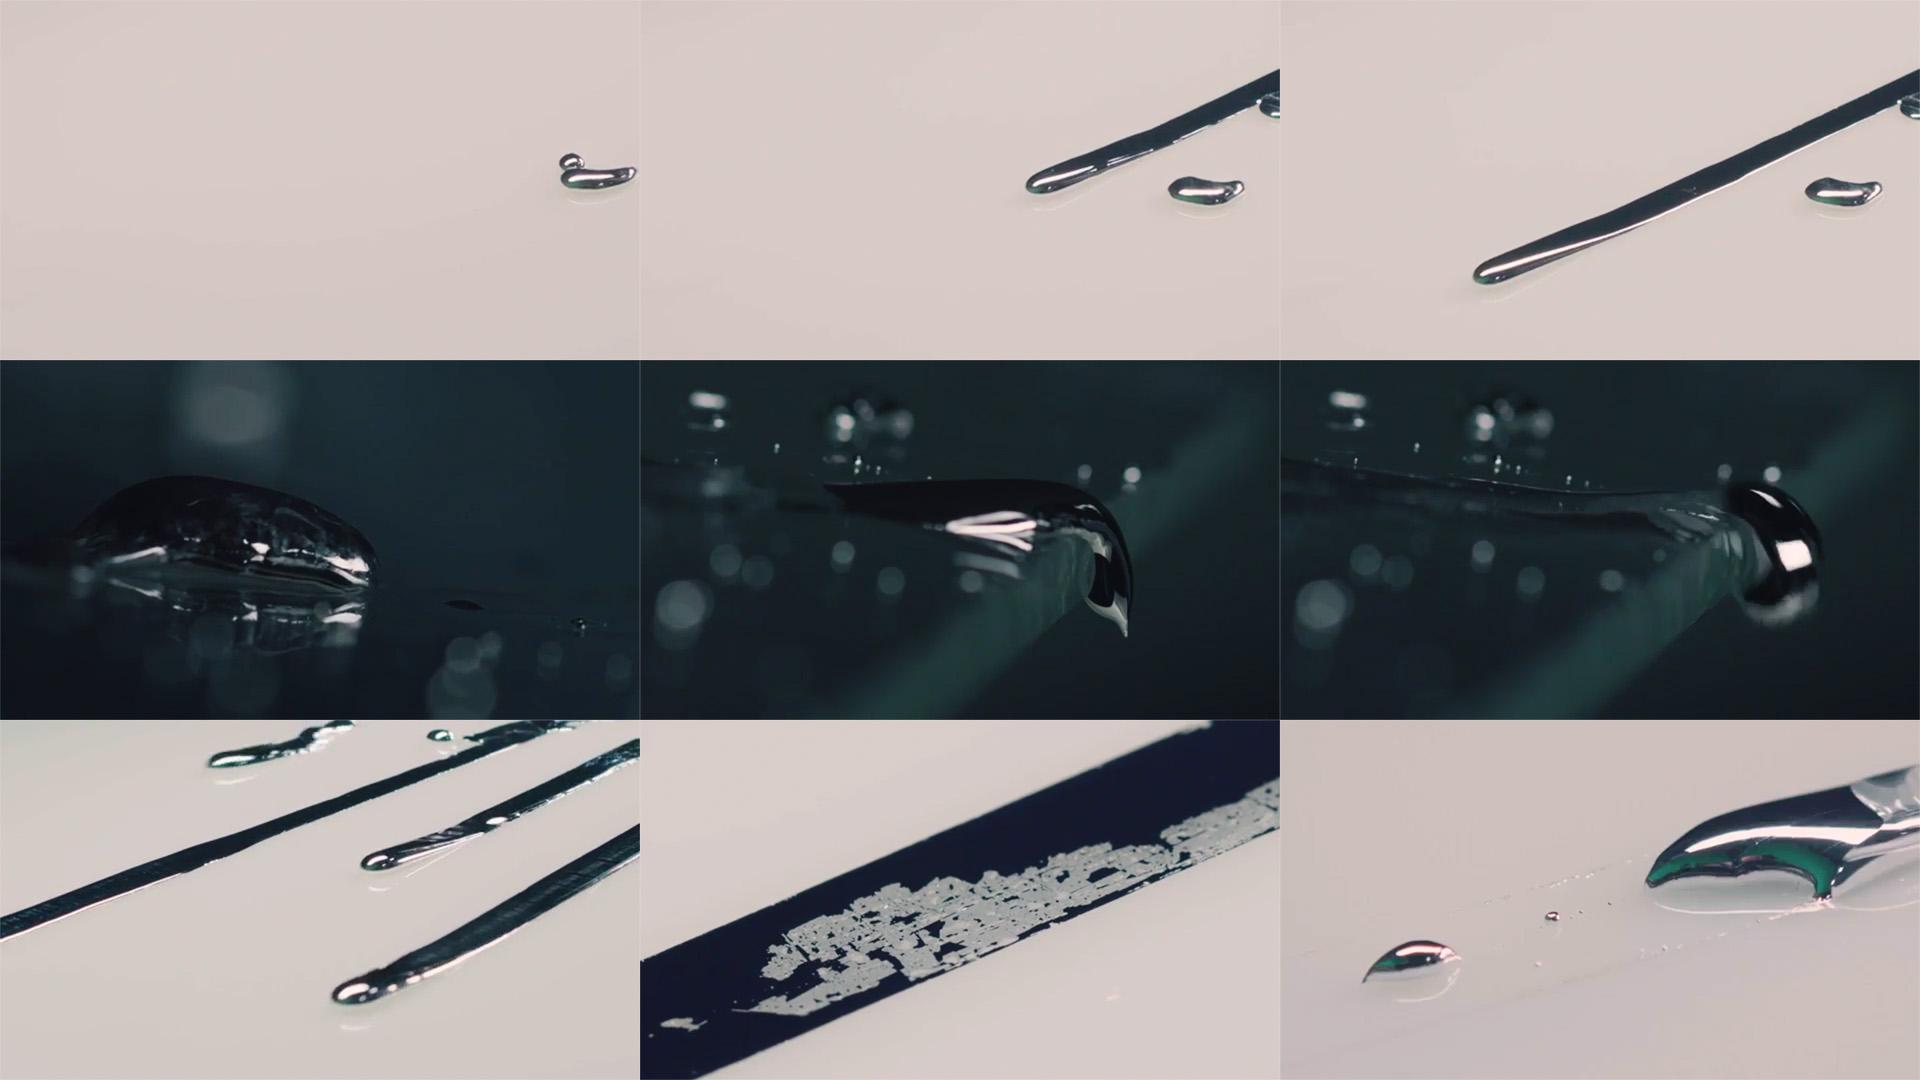 Image combining nine photos of liquid metals running across a surface.